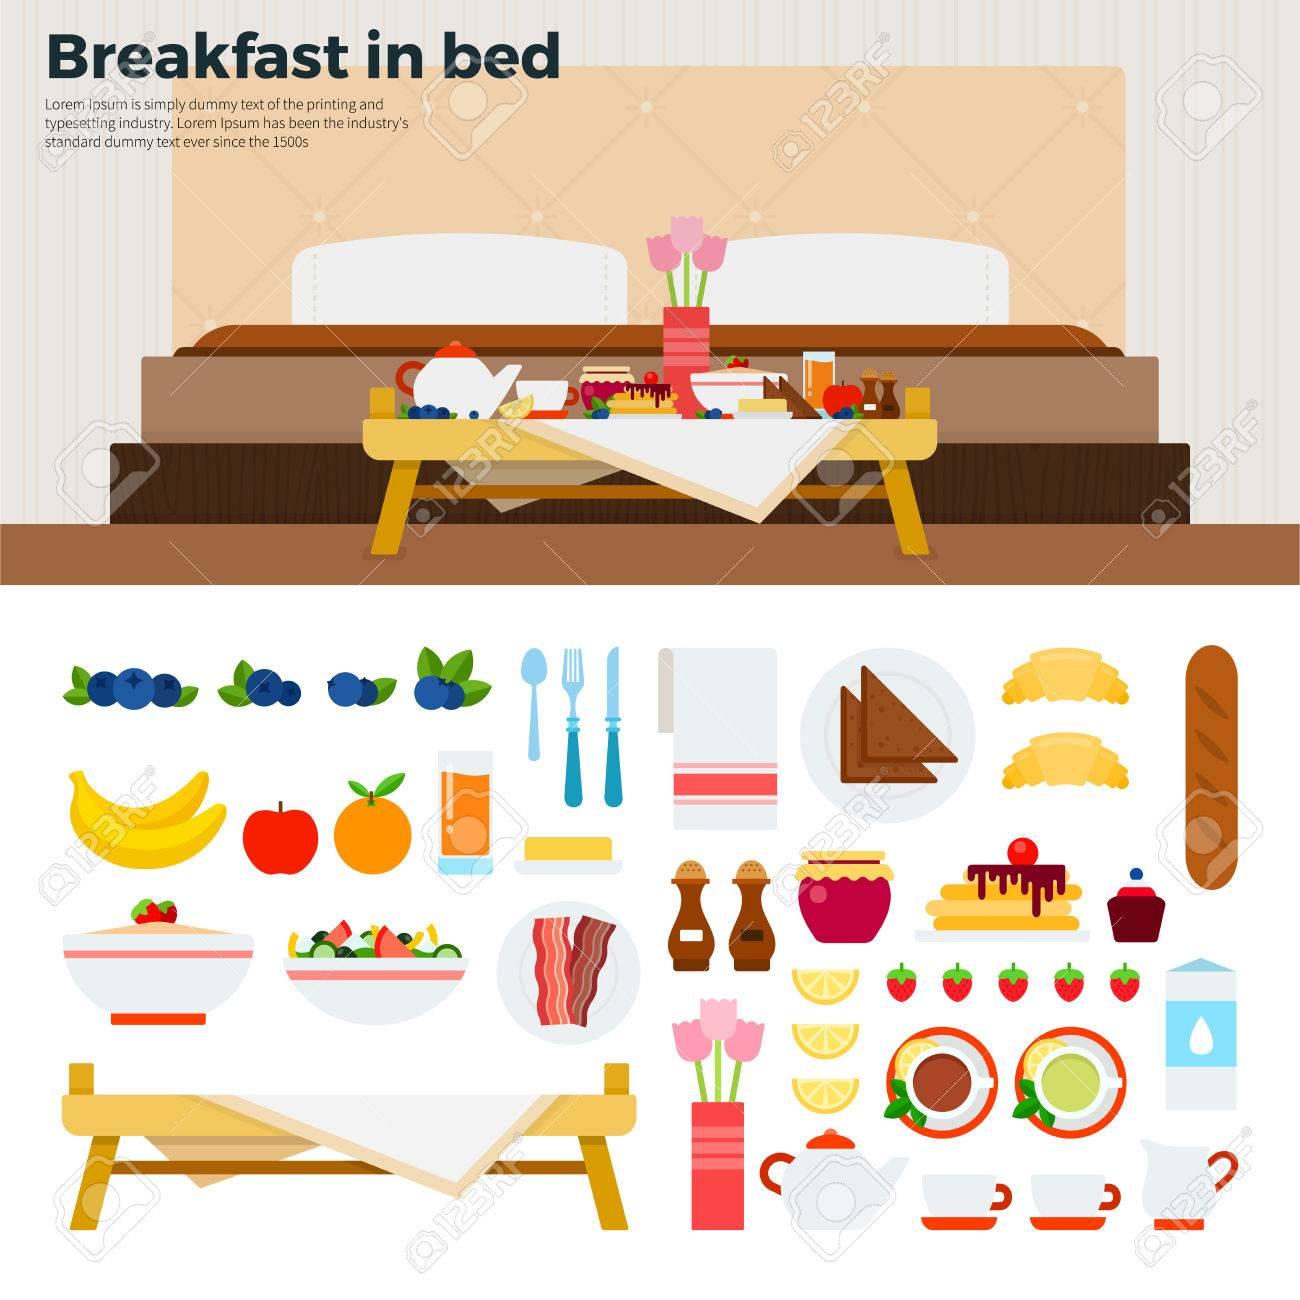 Fruhstuck Im Bett Flach Abbildungen Tabelle Mit Fruhstuck Im